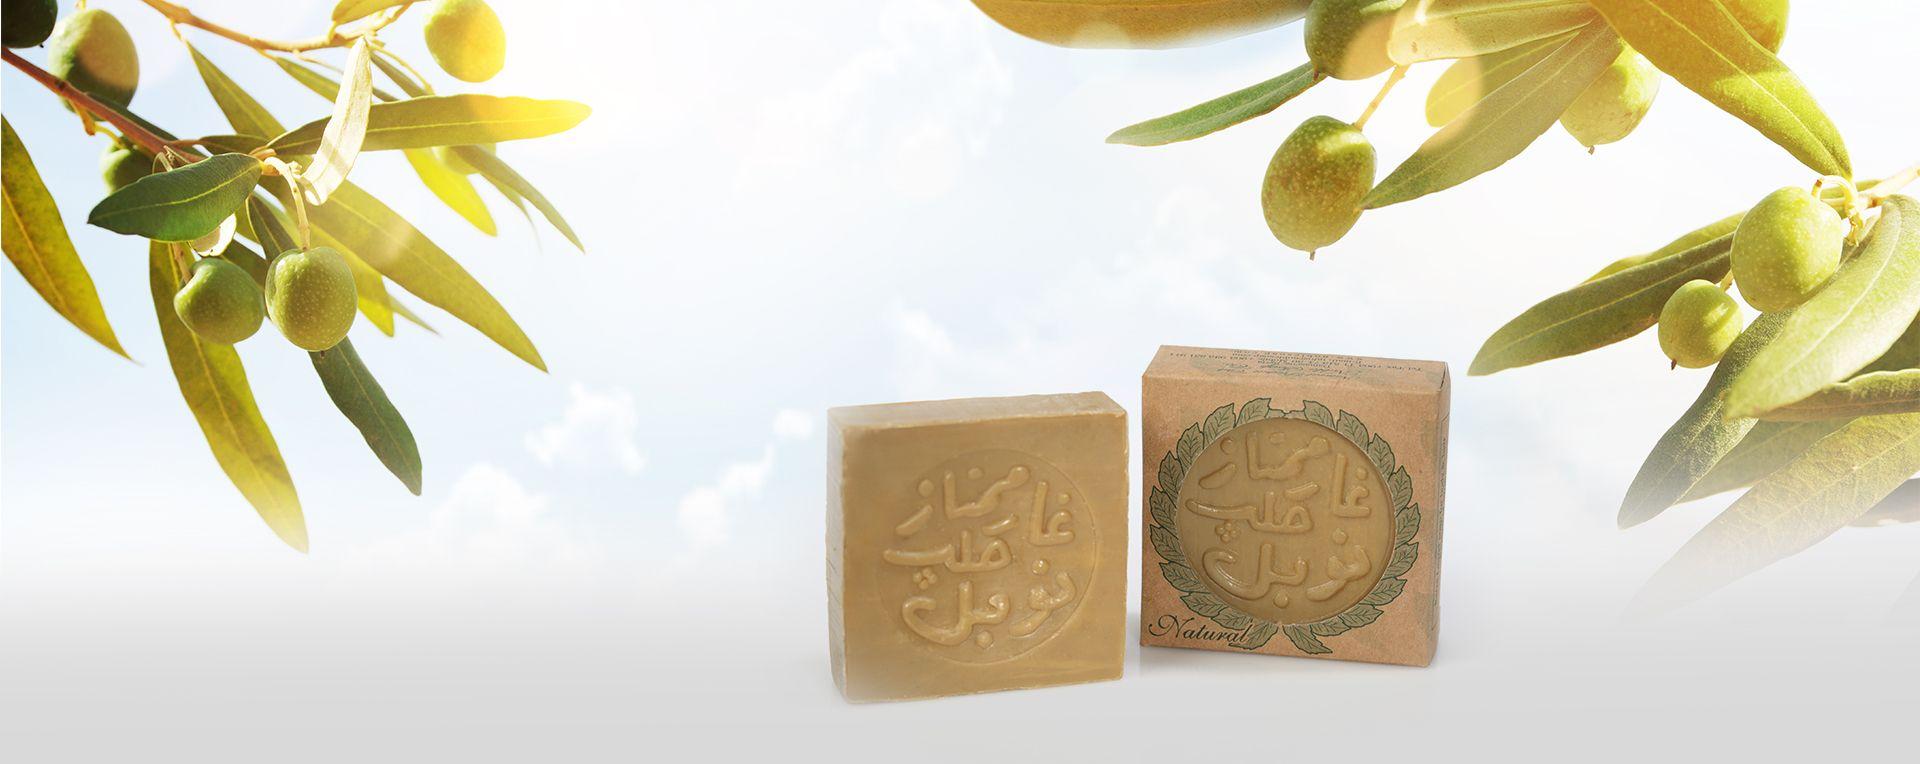 soap-banner-3